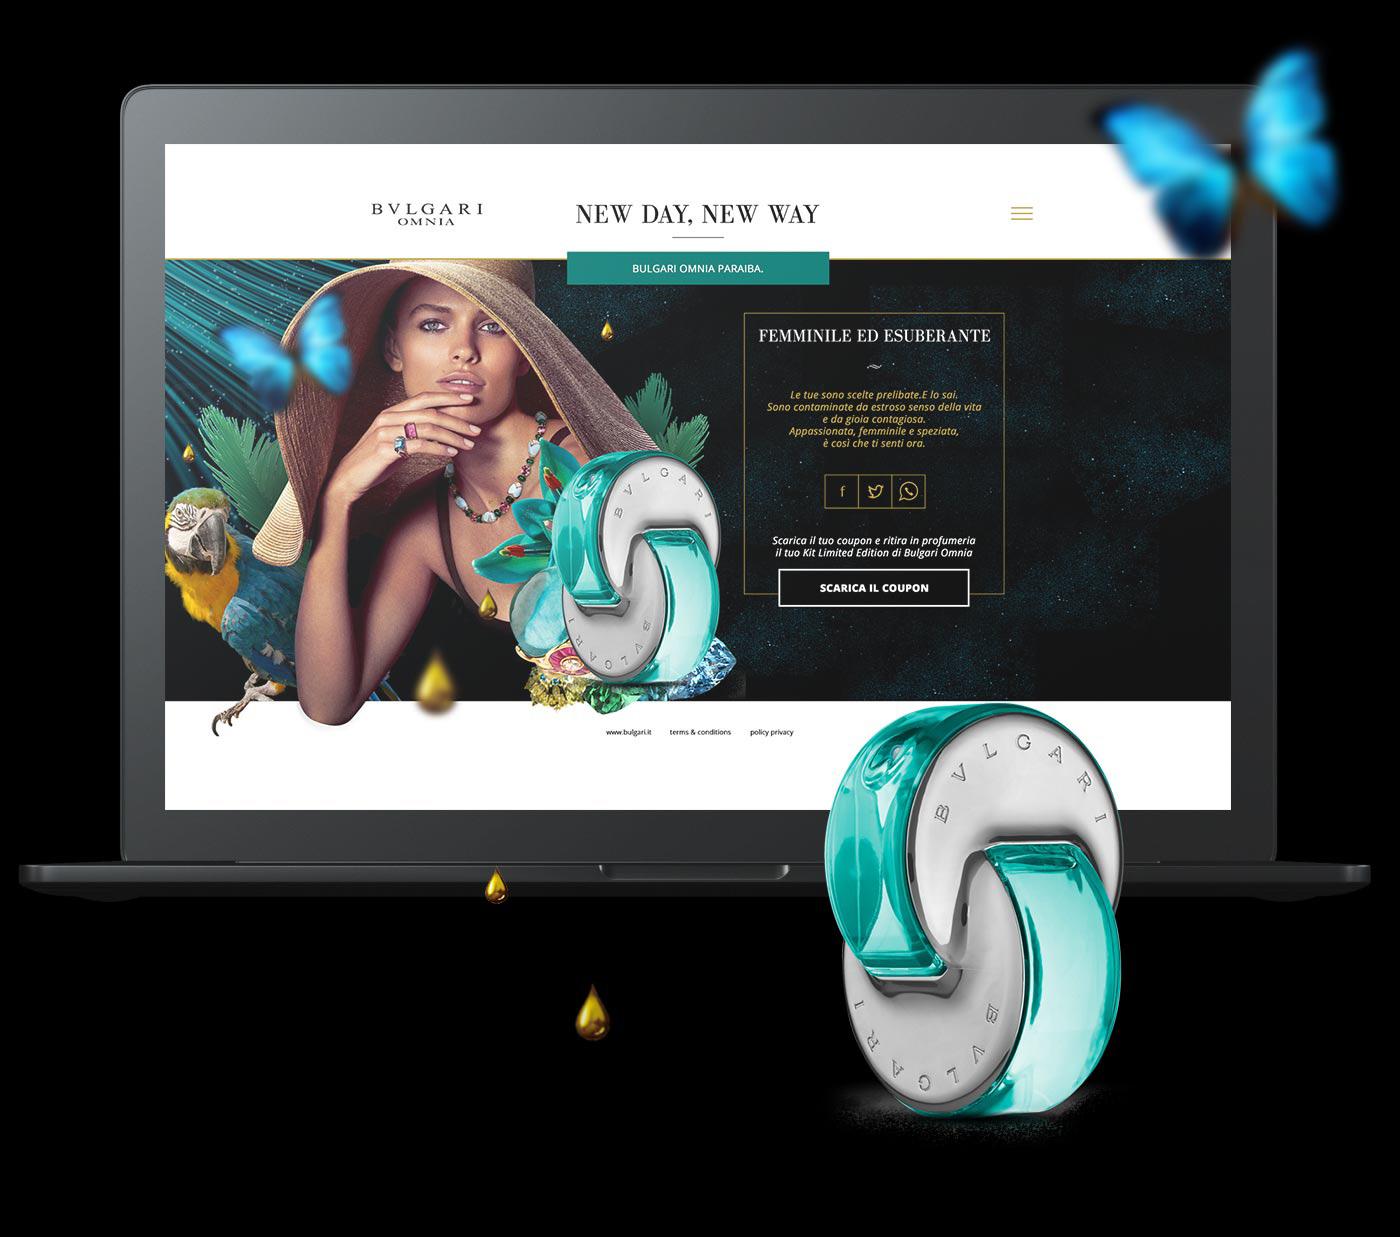 bulgari omnia grafico milano homepage